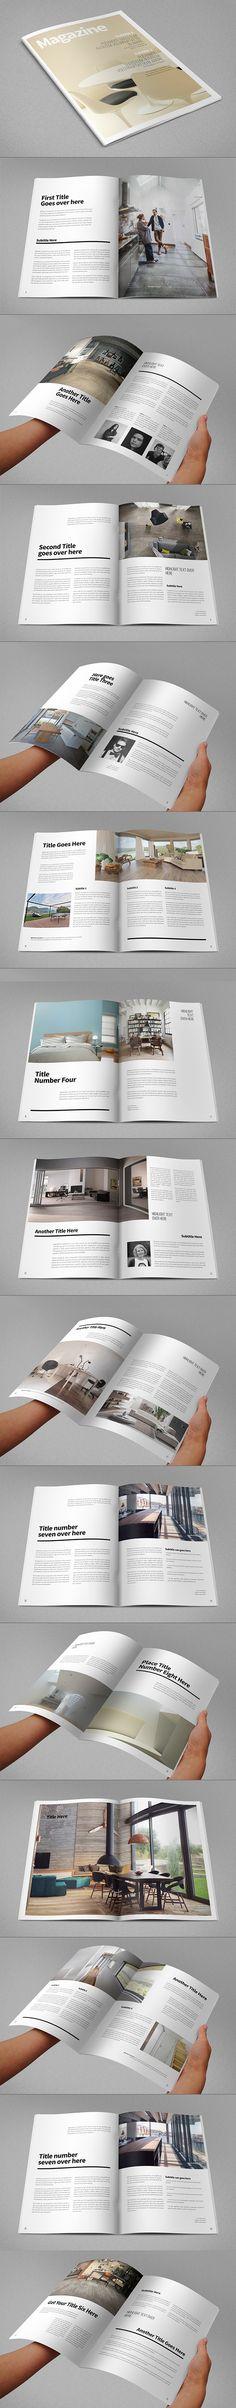 Minimal Design Magazine. Download here: http://graphicriver.net/item/minimal-design-magazine/10049560?ref=abradesign #design #magazine #mag